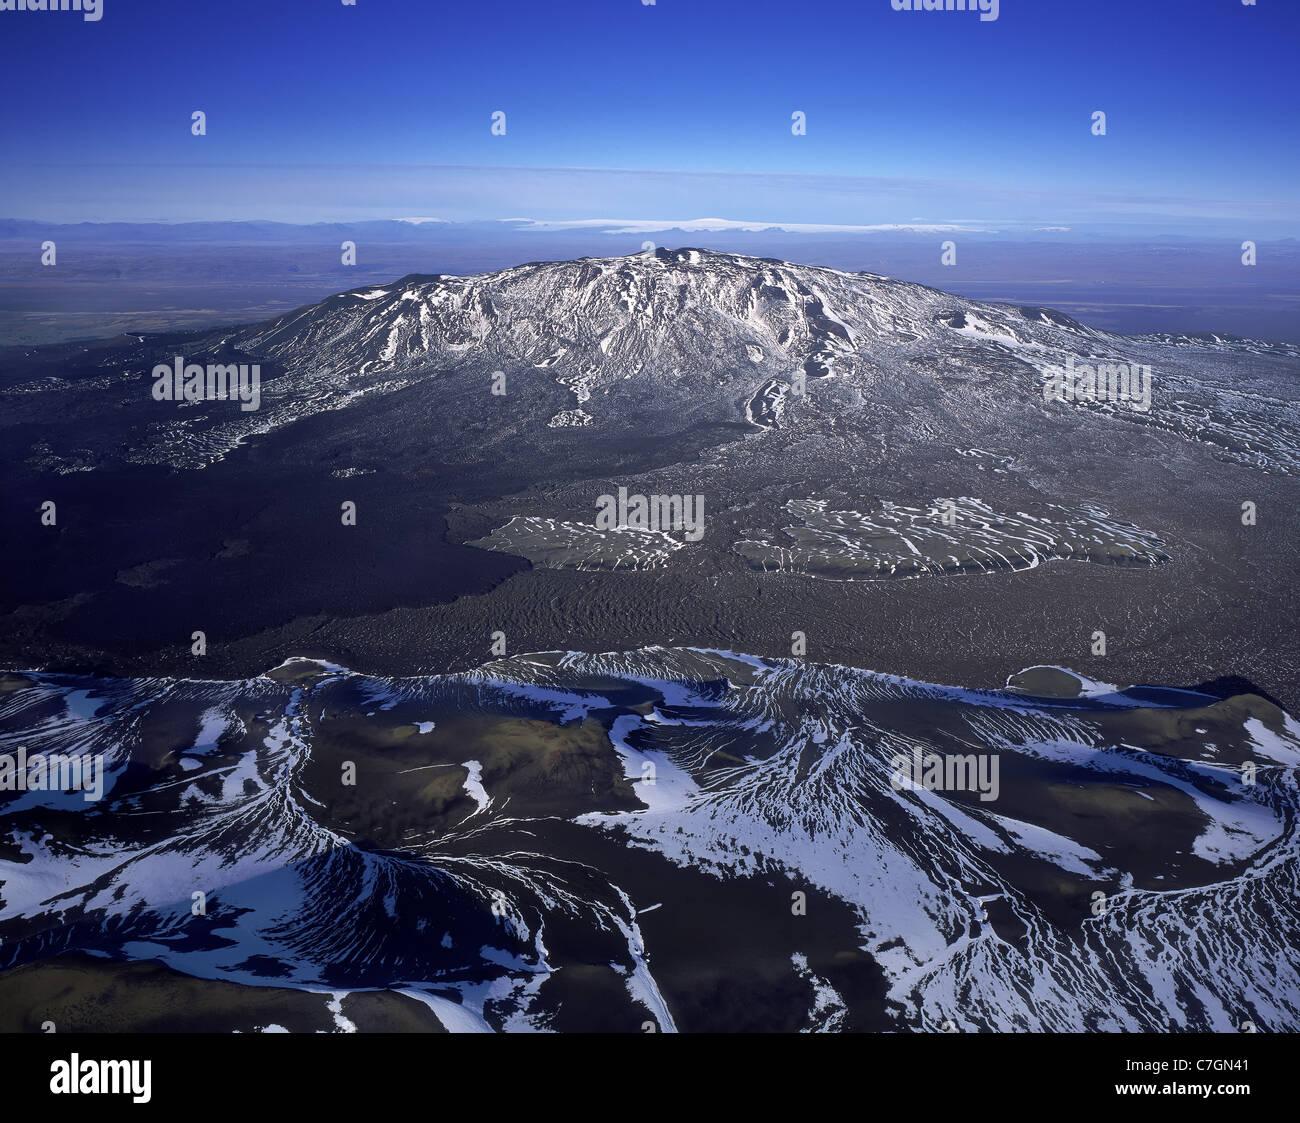 Mt Hekla, active volcano, Iceland - Stock Image